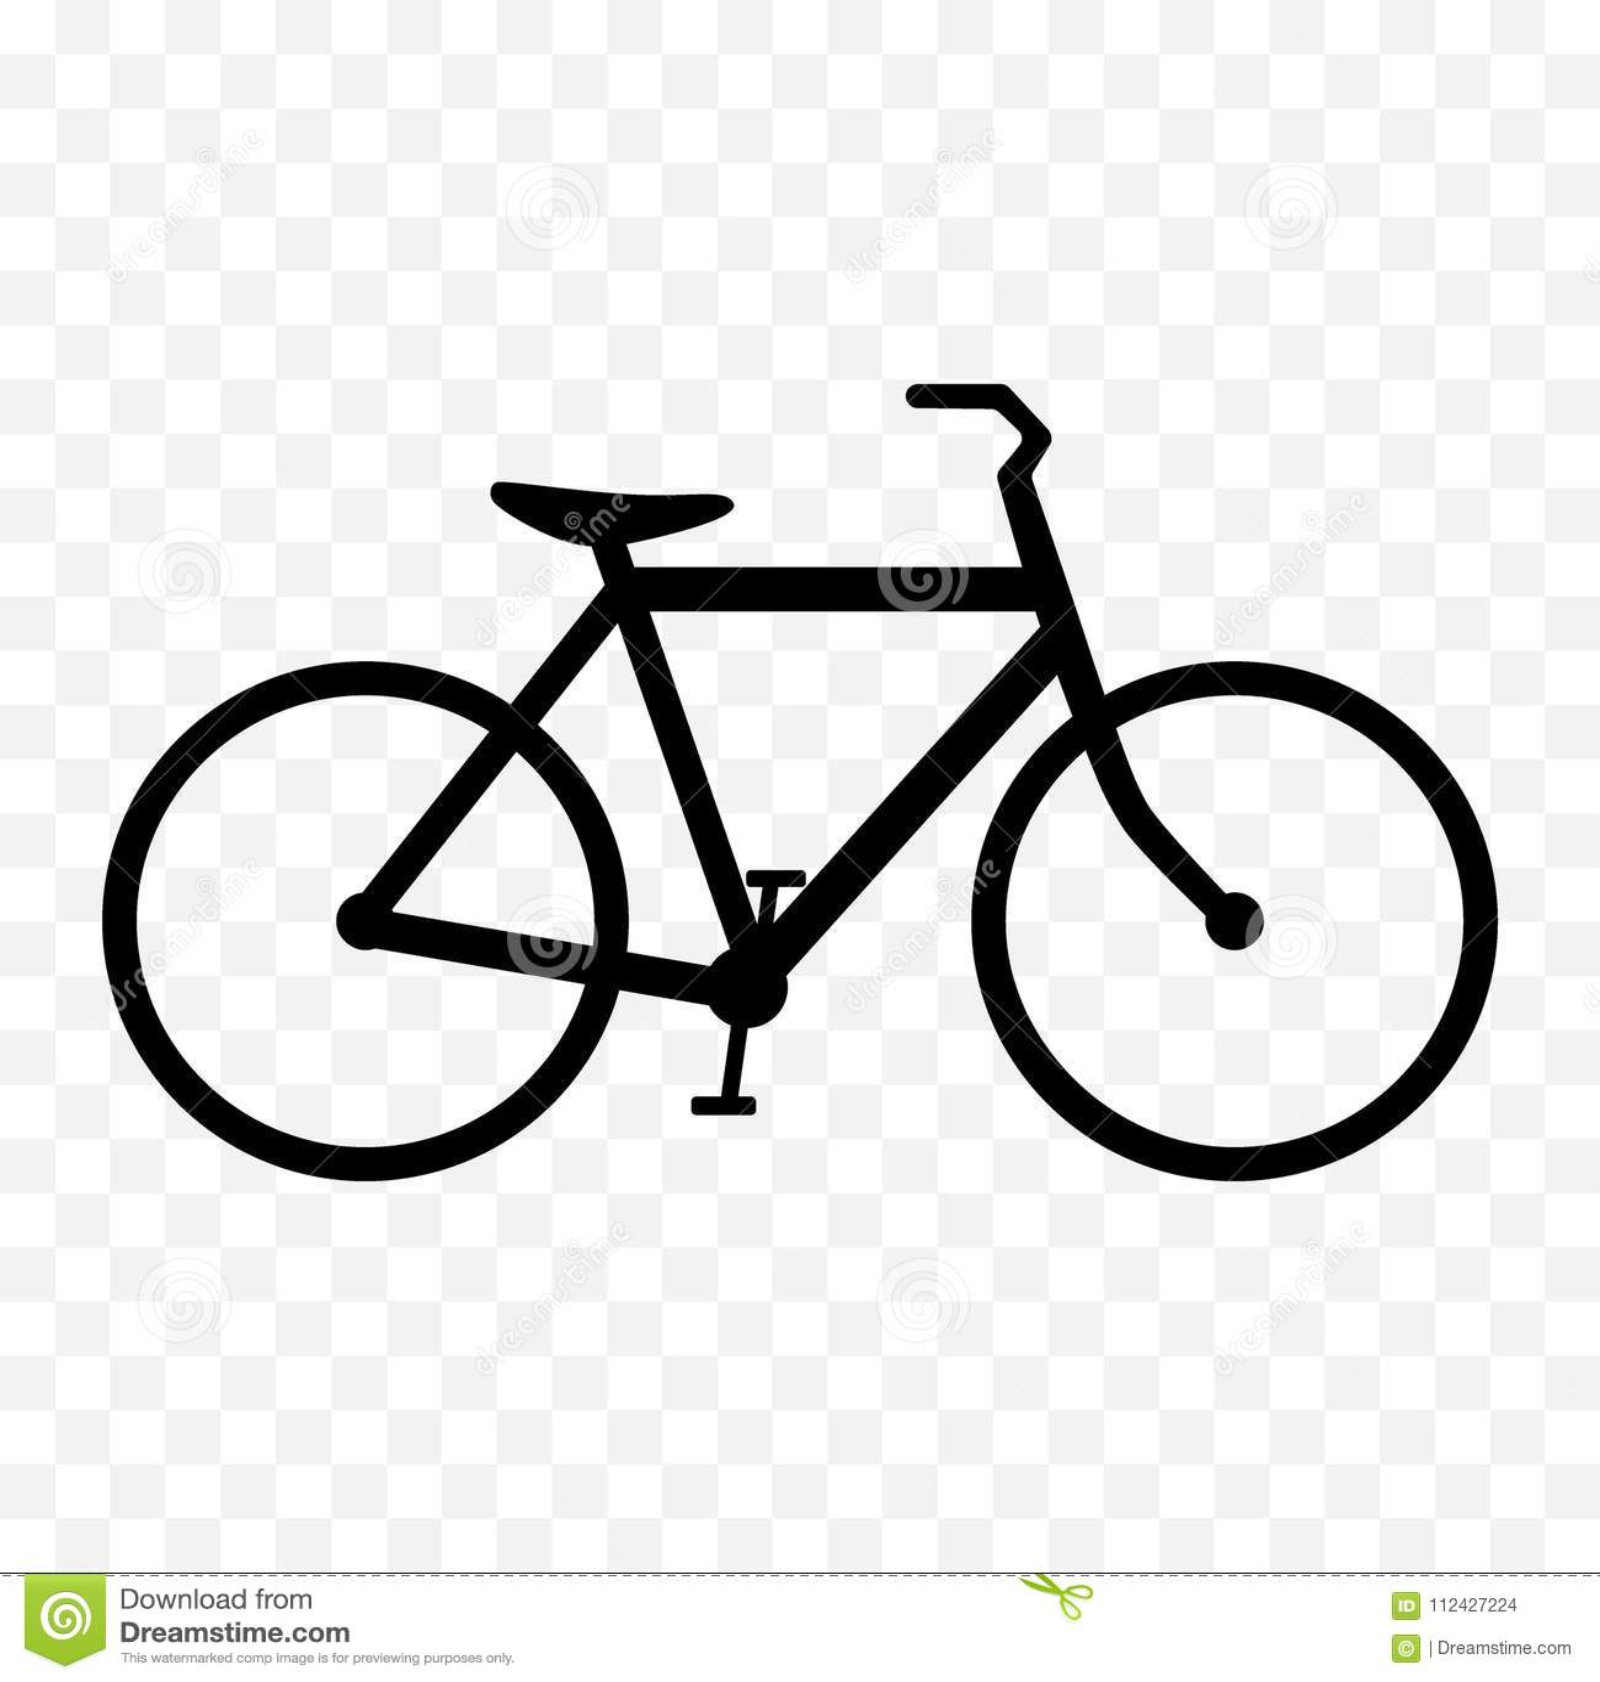 Vector icons bike